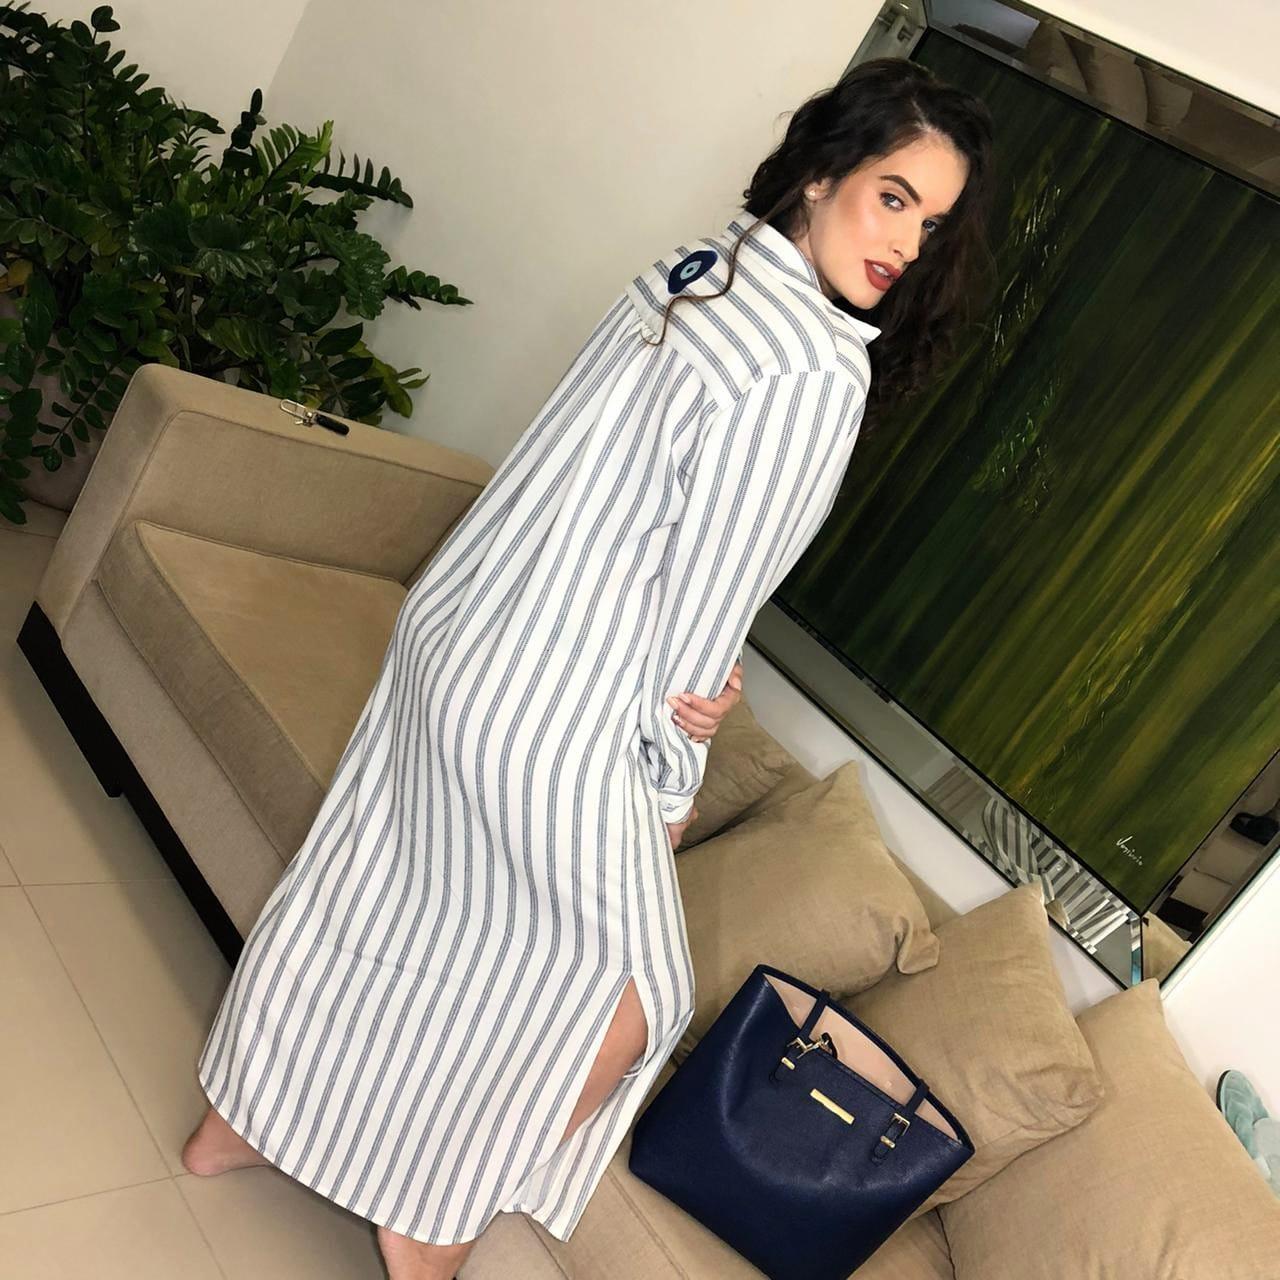 Pijamas 100% Algodão / seda